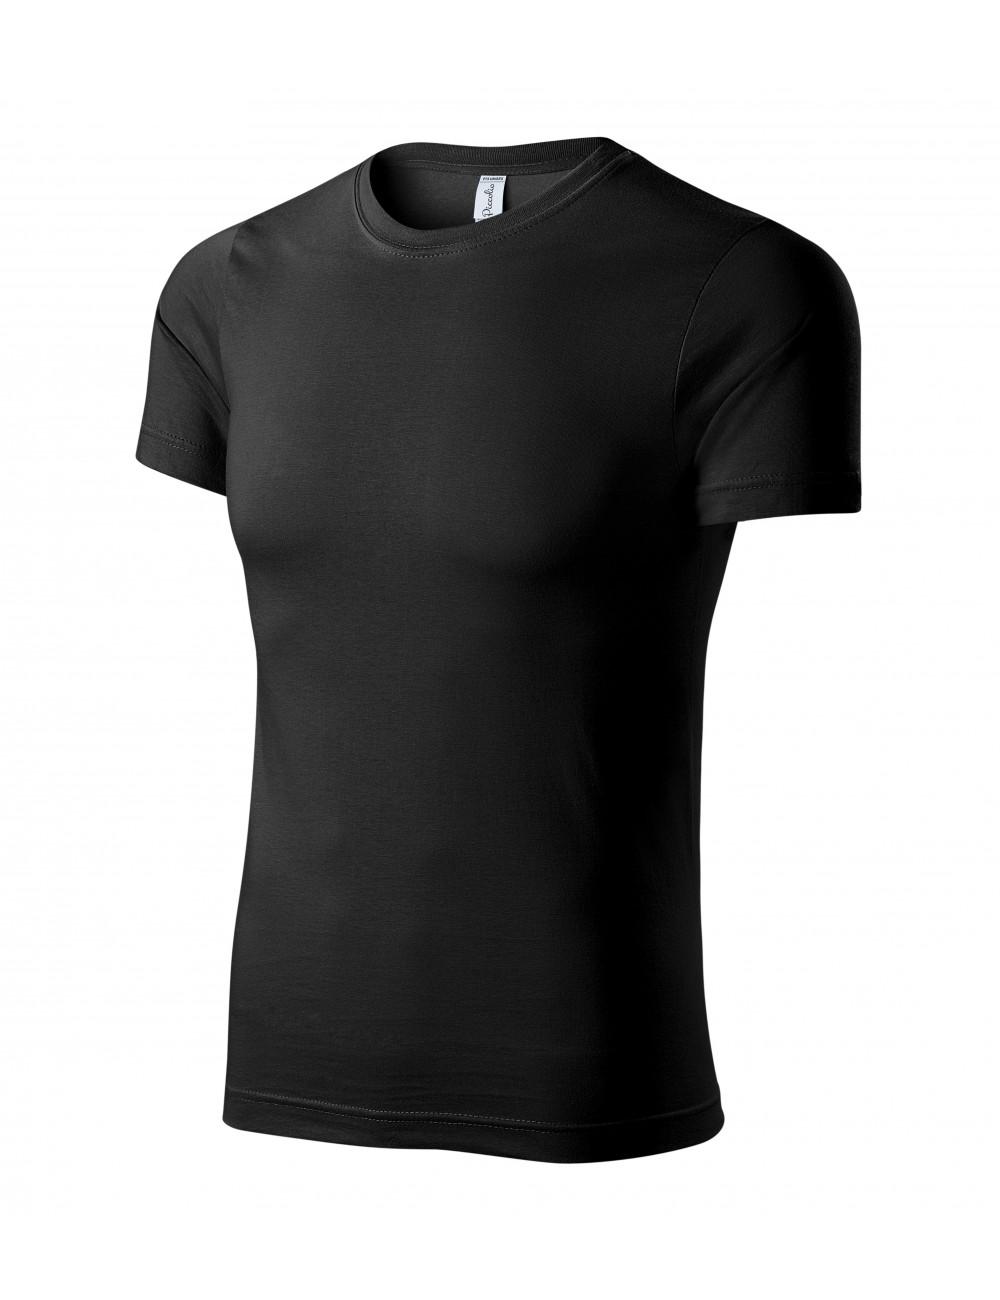 Adler PICCOLIO Koszulka unisex Paint P73 czarny